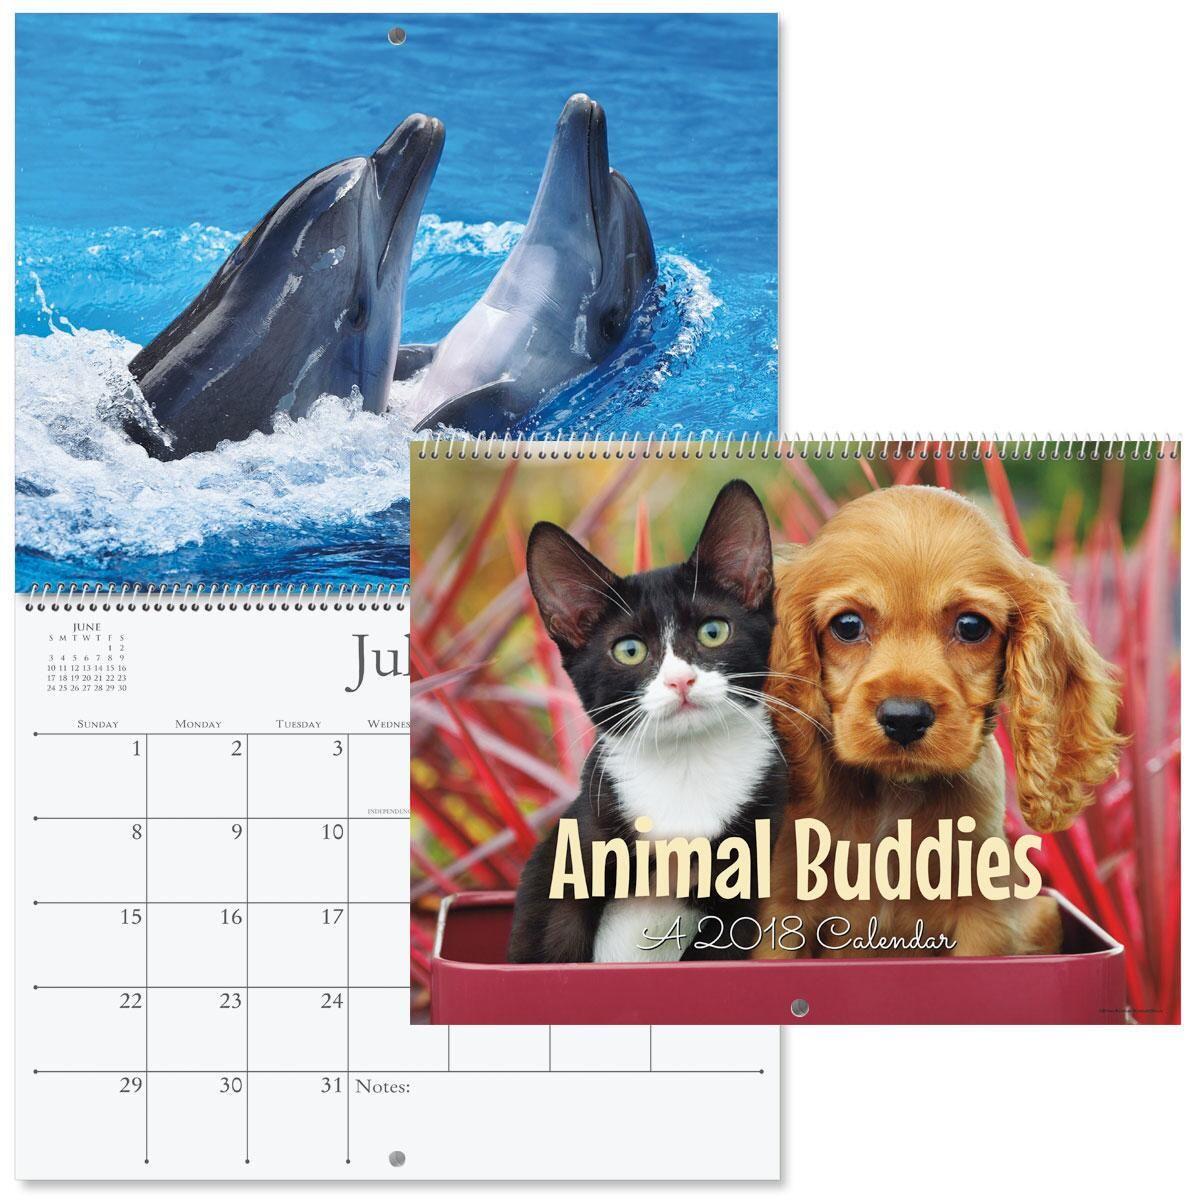 2018 Animal Buddies Wall Calendar